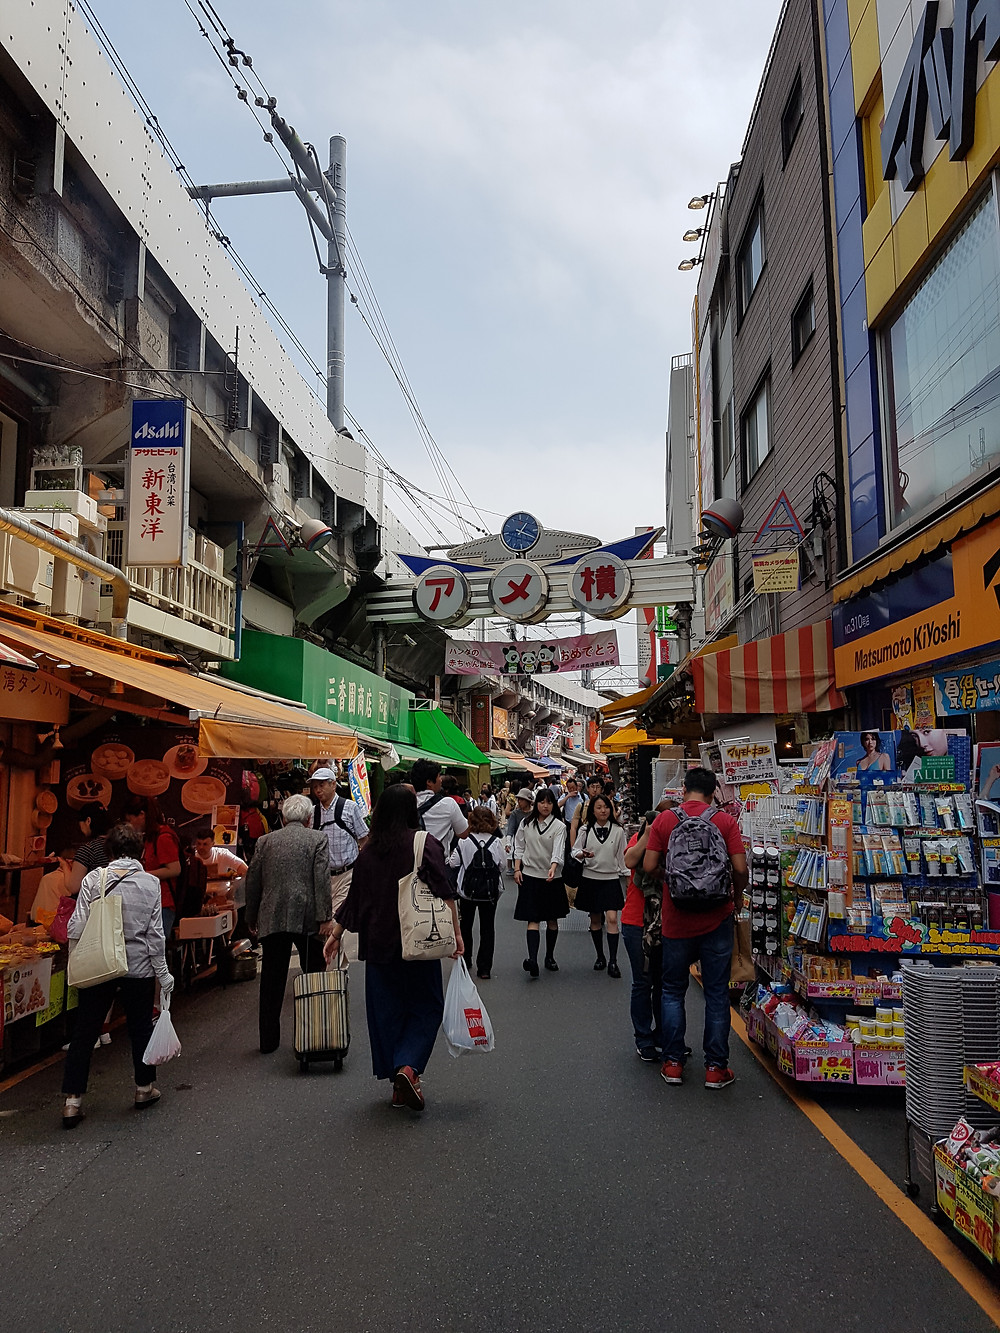 Ameyko Shopping Street